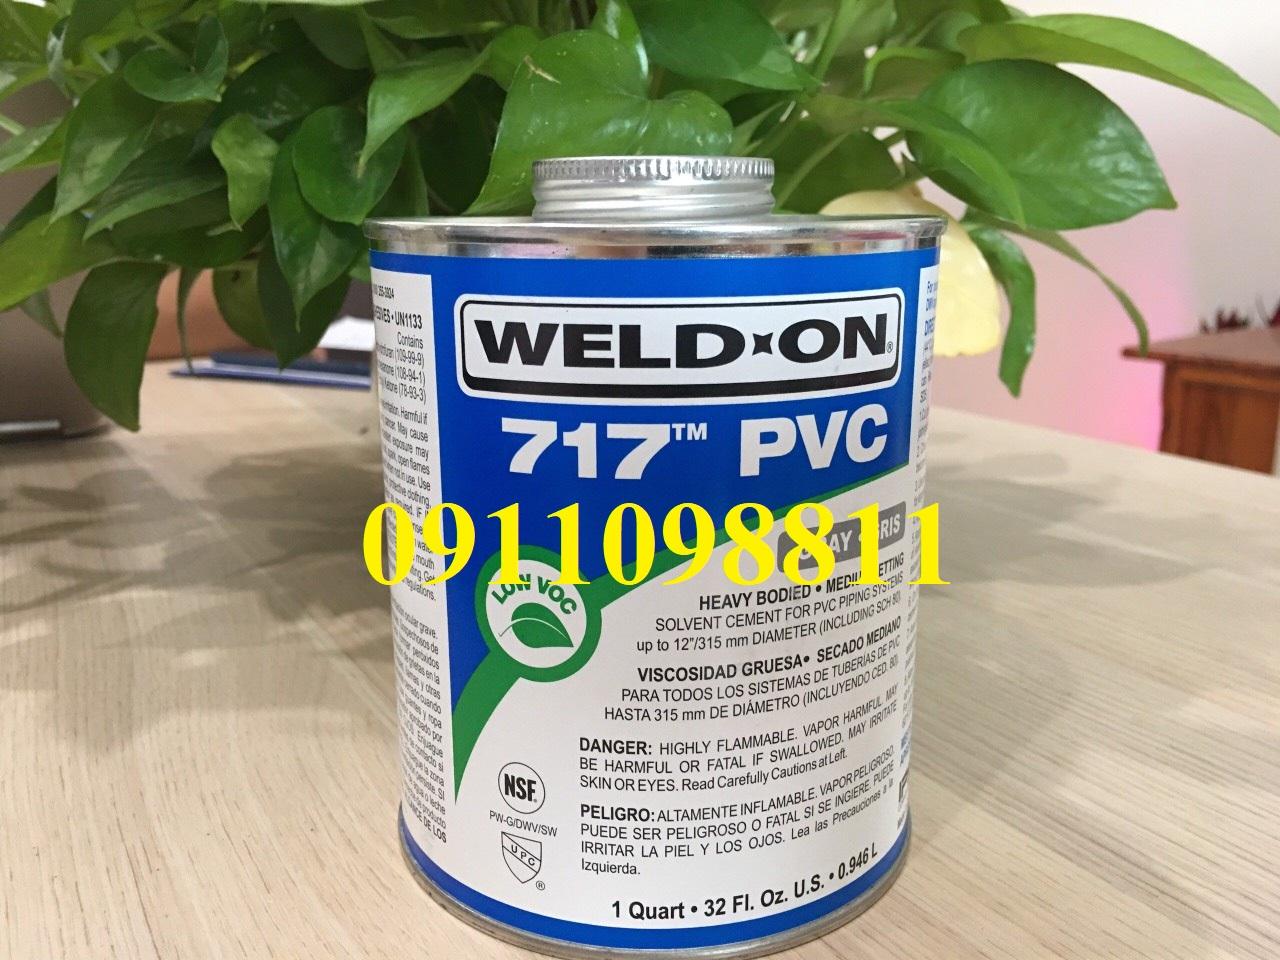 KEO DÁN ỐNG UPVC WELDON 717